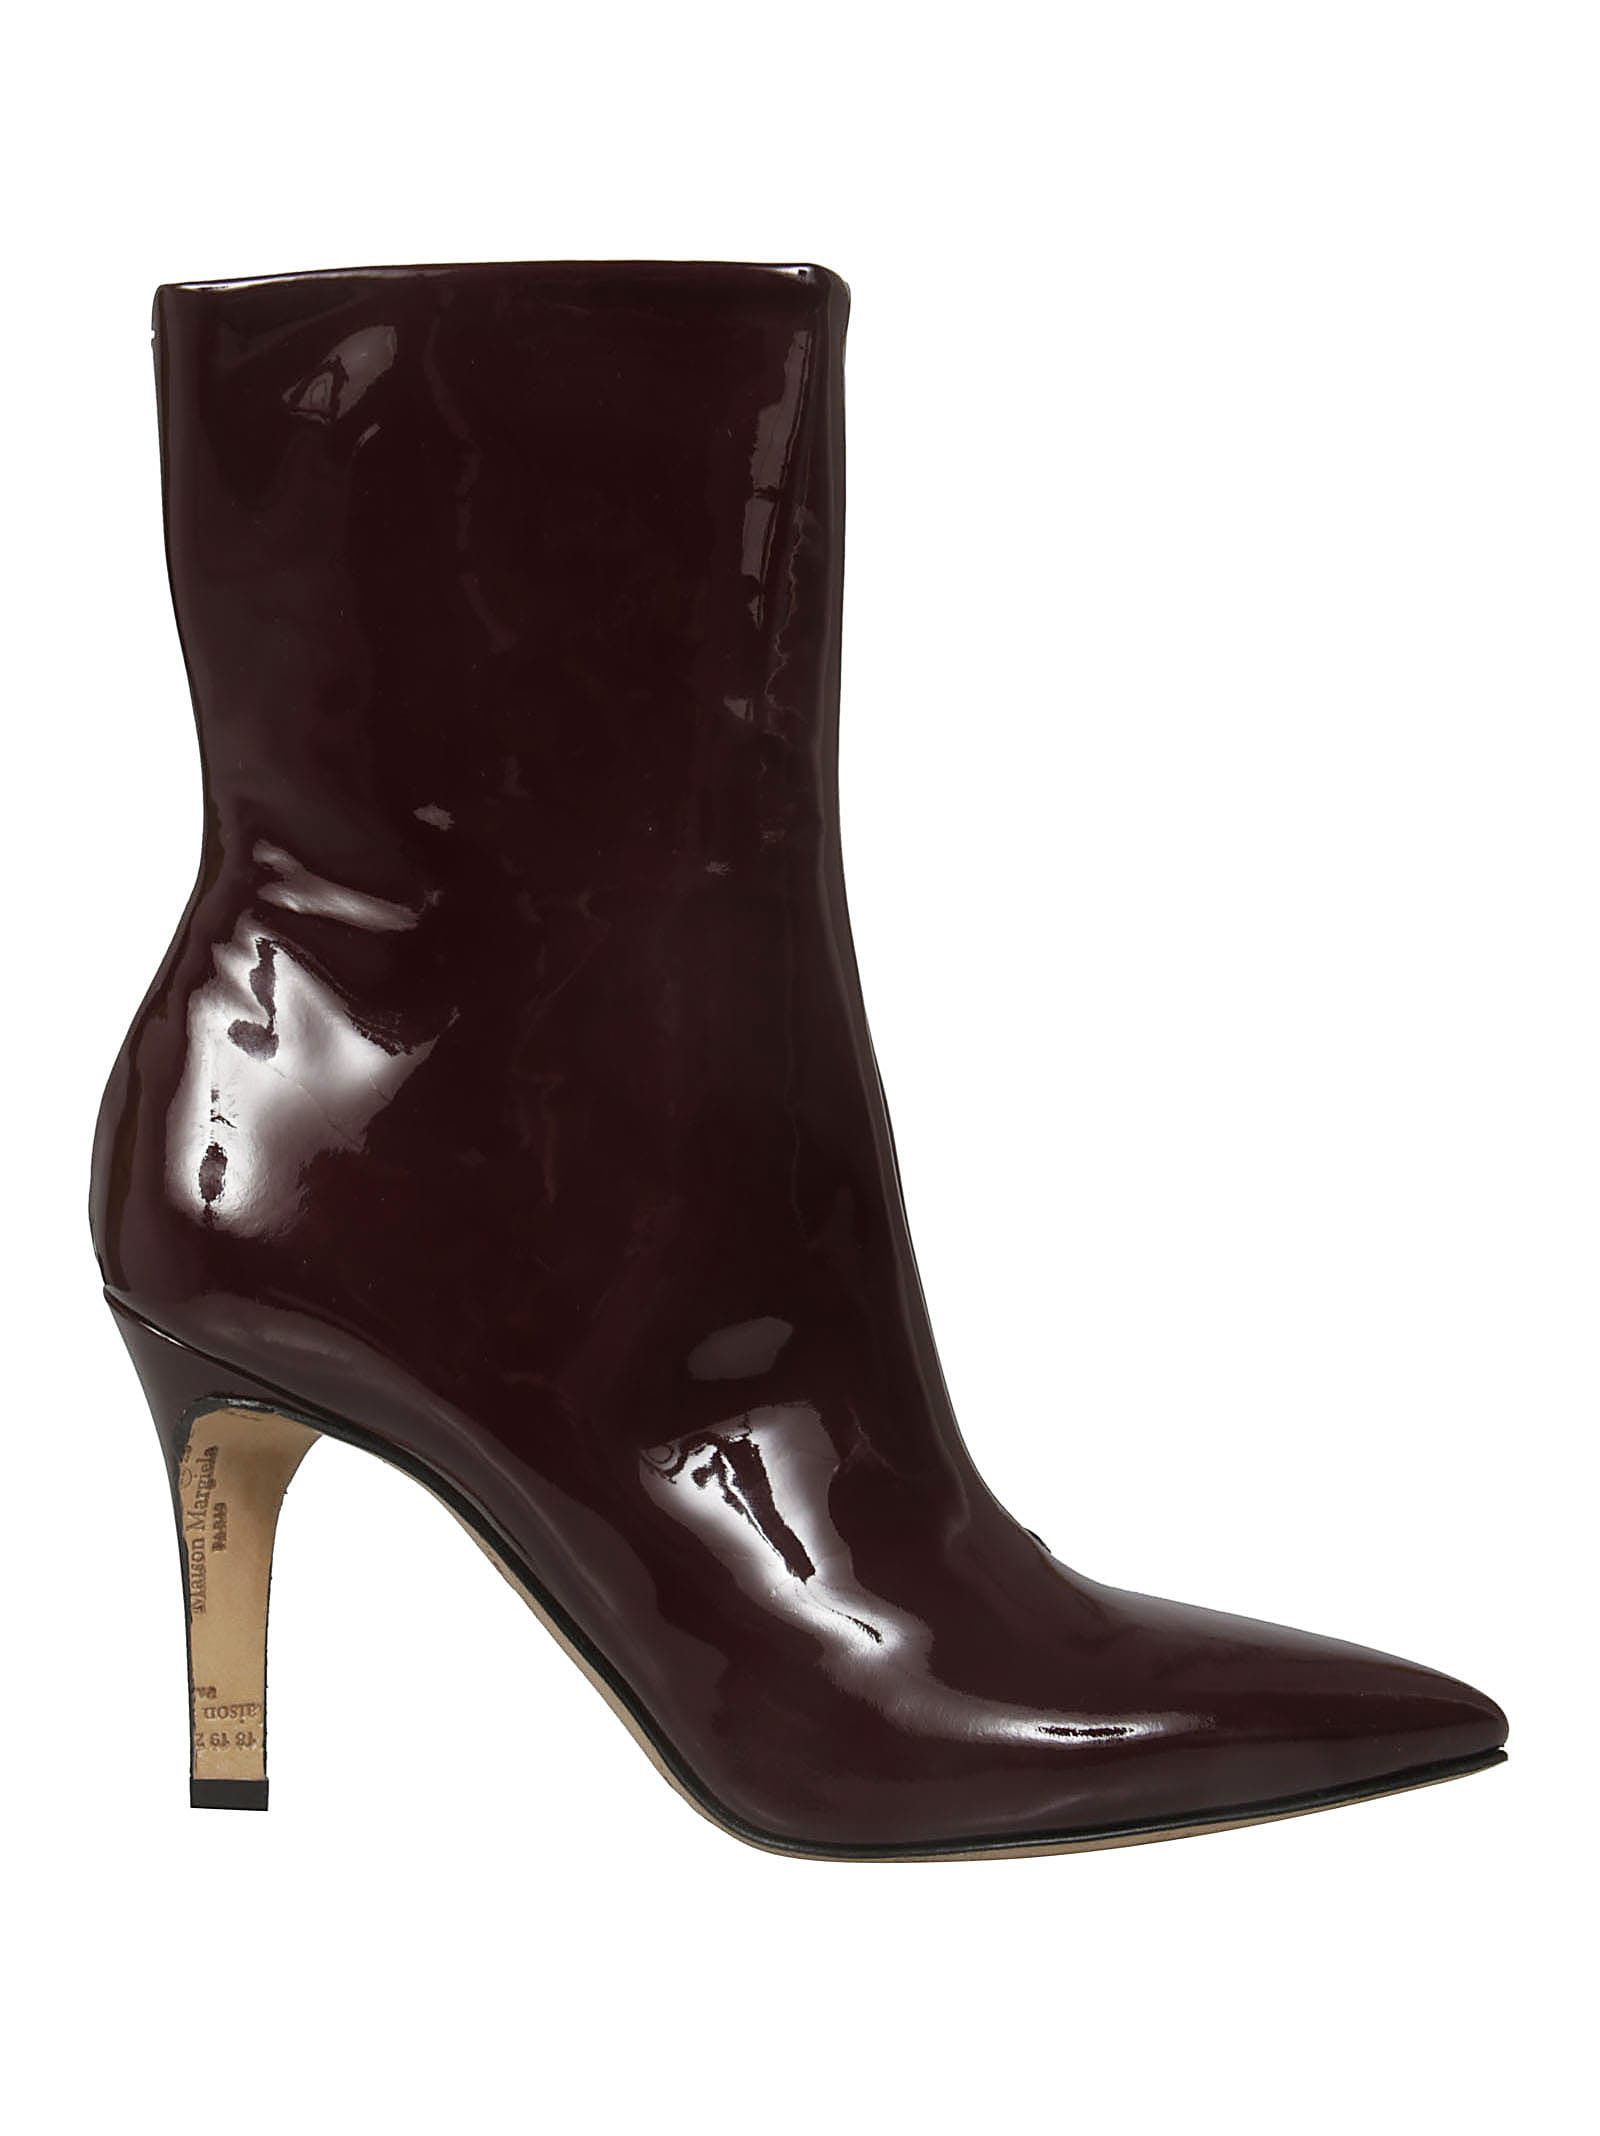 Maison Margiela Side-zipped Ankle Boots